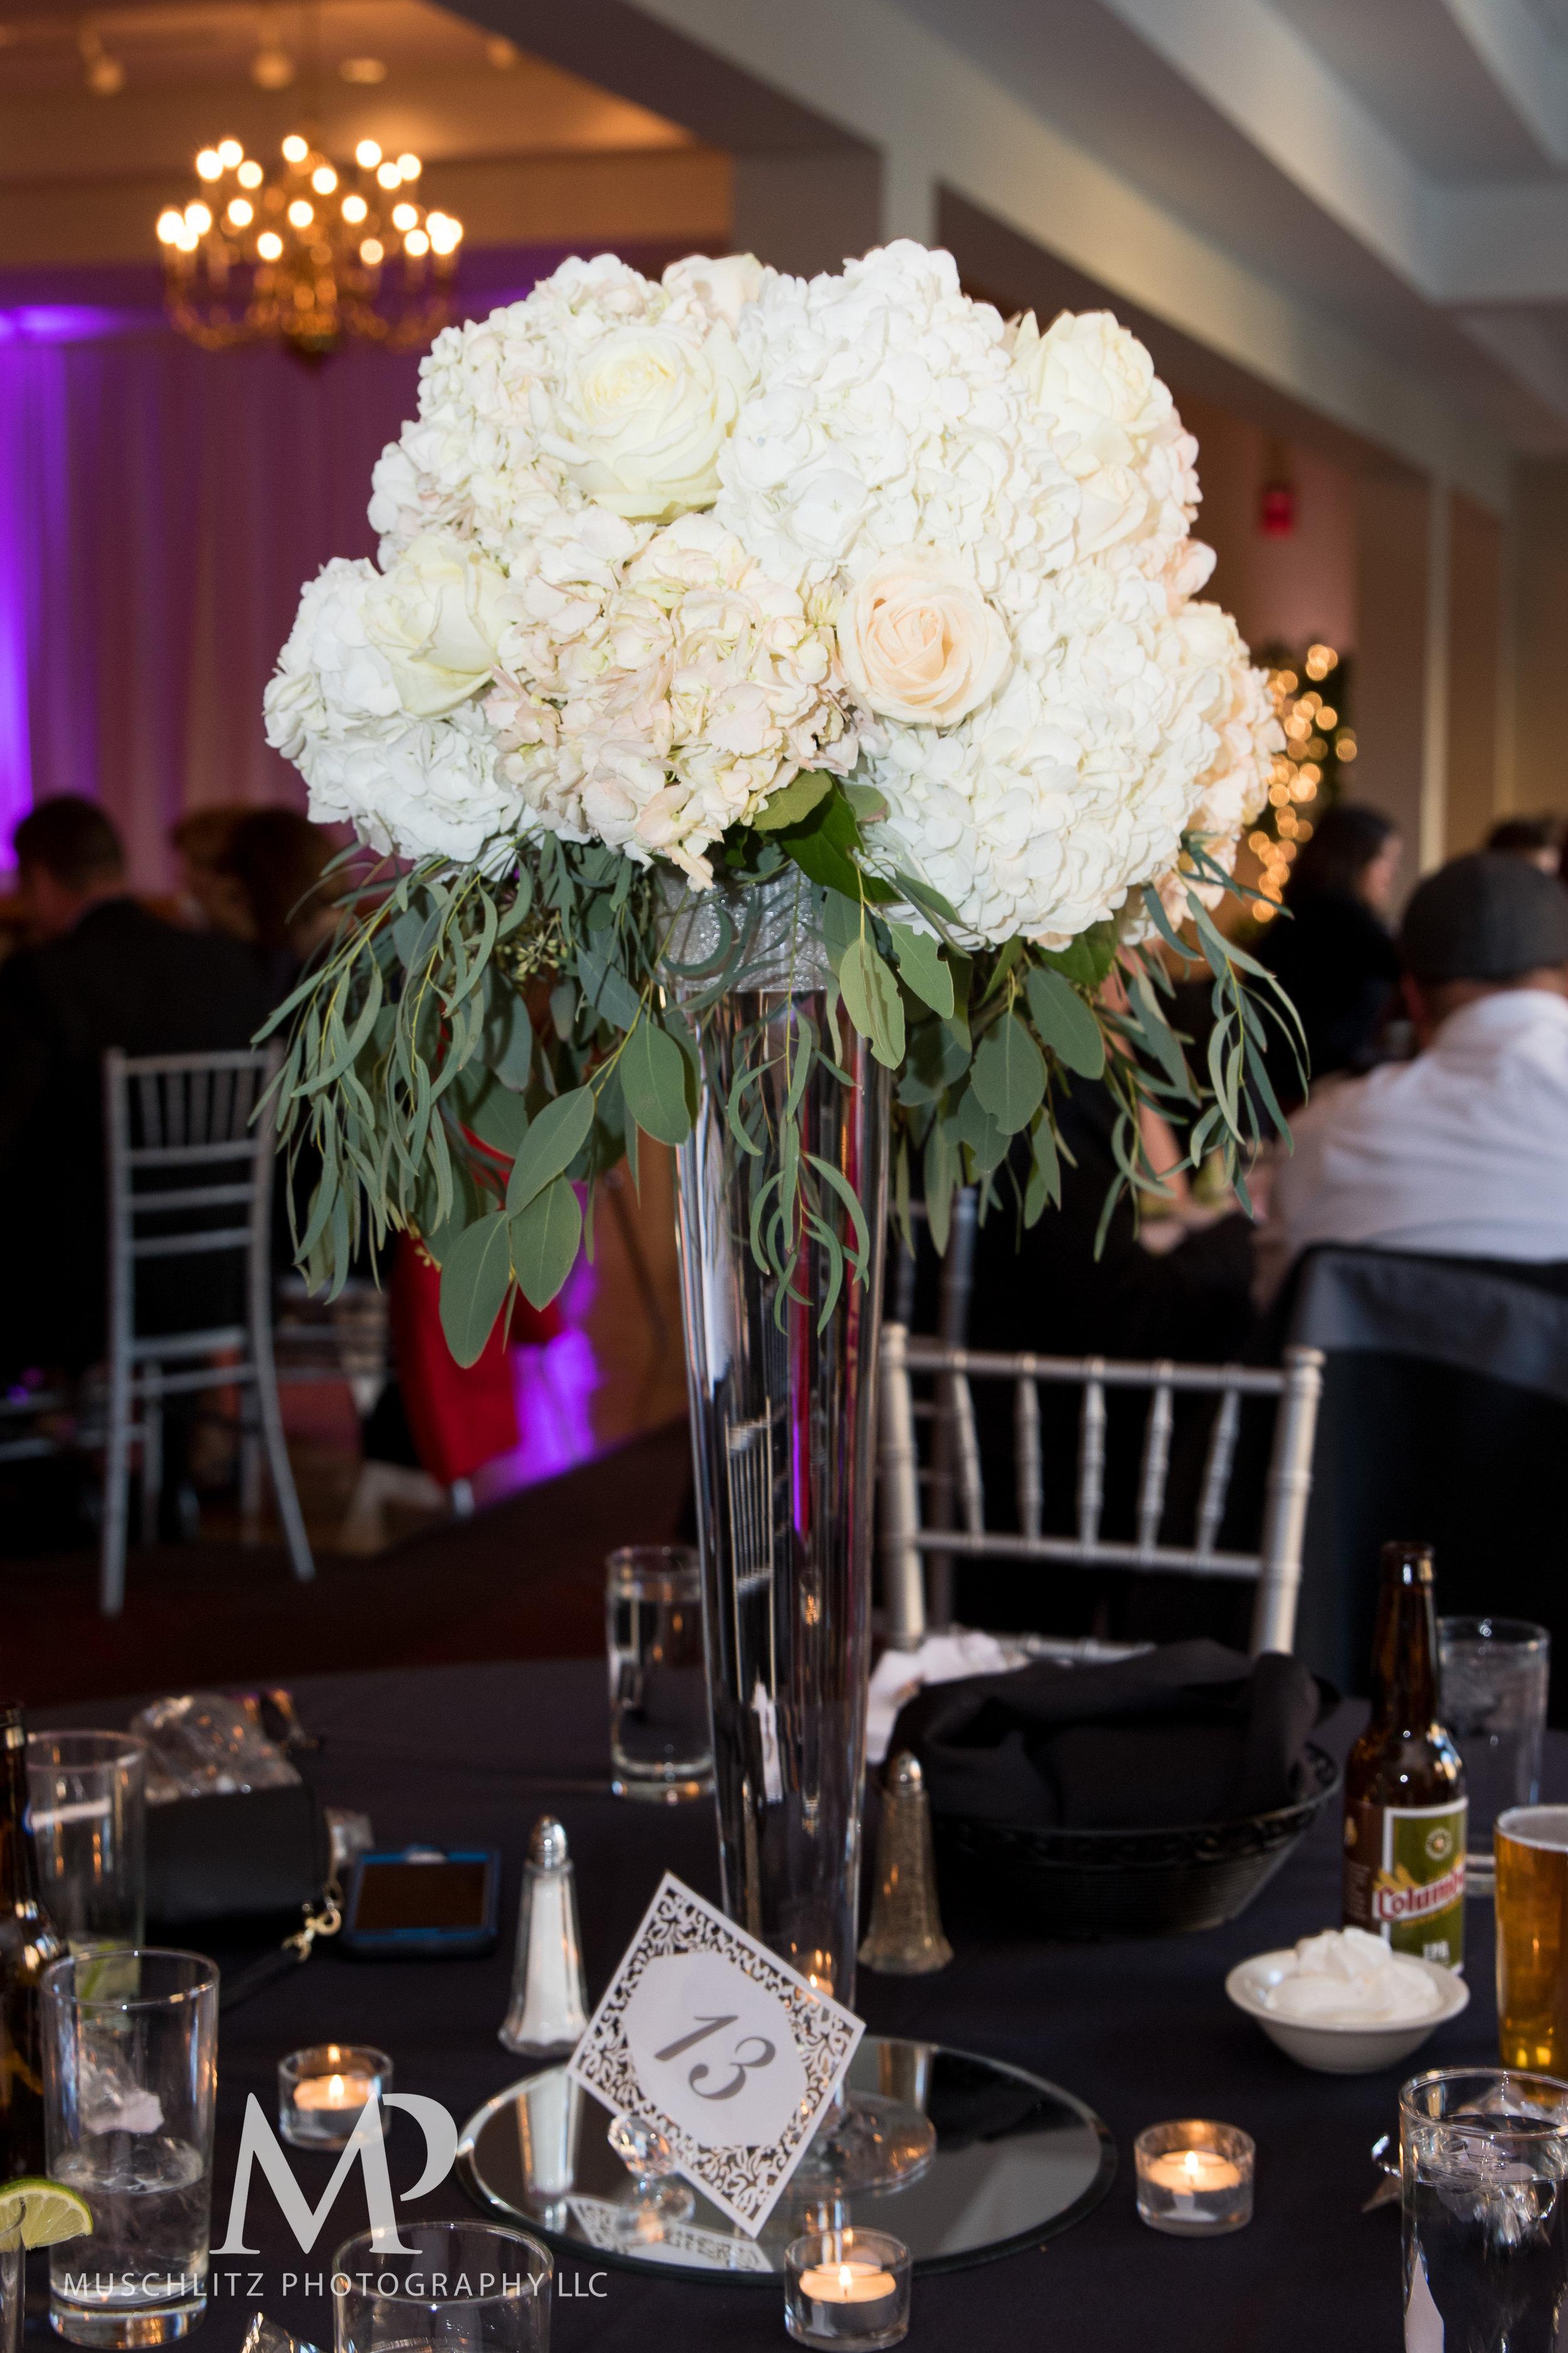 annunciation-banquet-conference-center-downtown-columbus-wedding-reception-downtown-columbus-ohio-muschlitz-photography-008.JPG